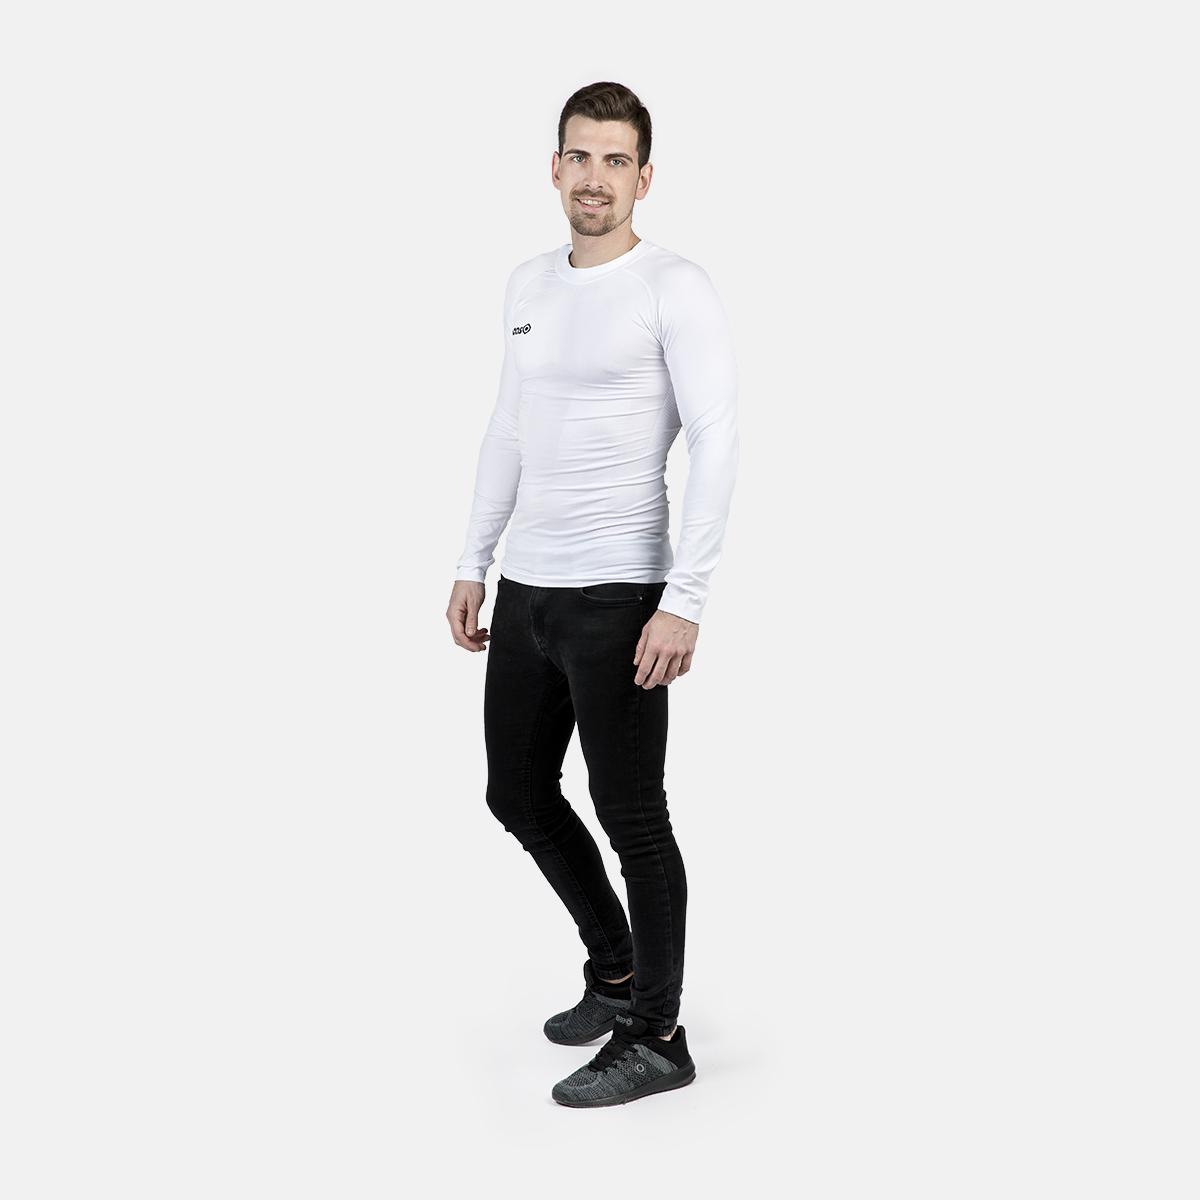 UNISEX'S SAREK THERMAL T-SHIRT WHITE